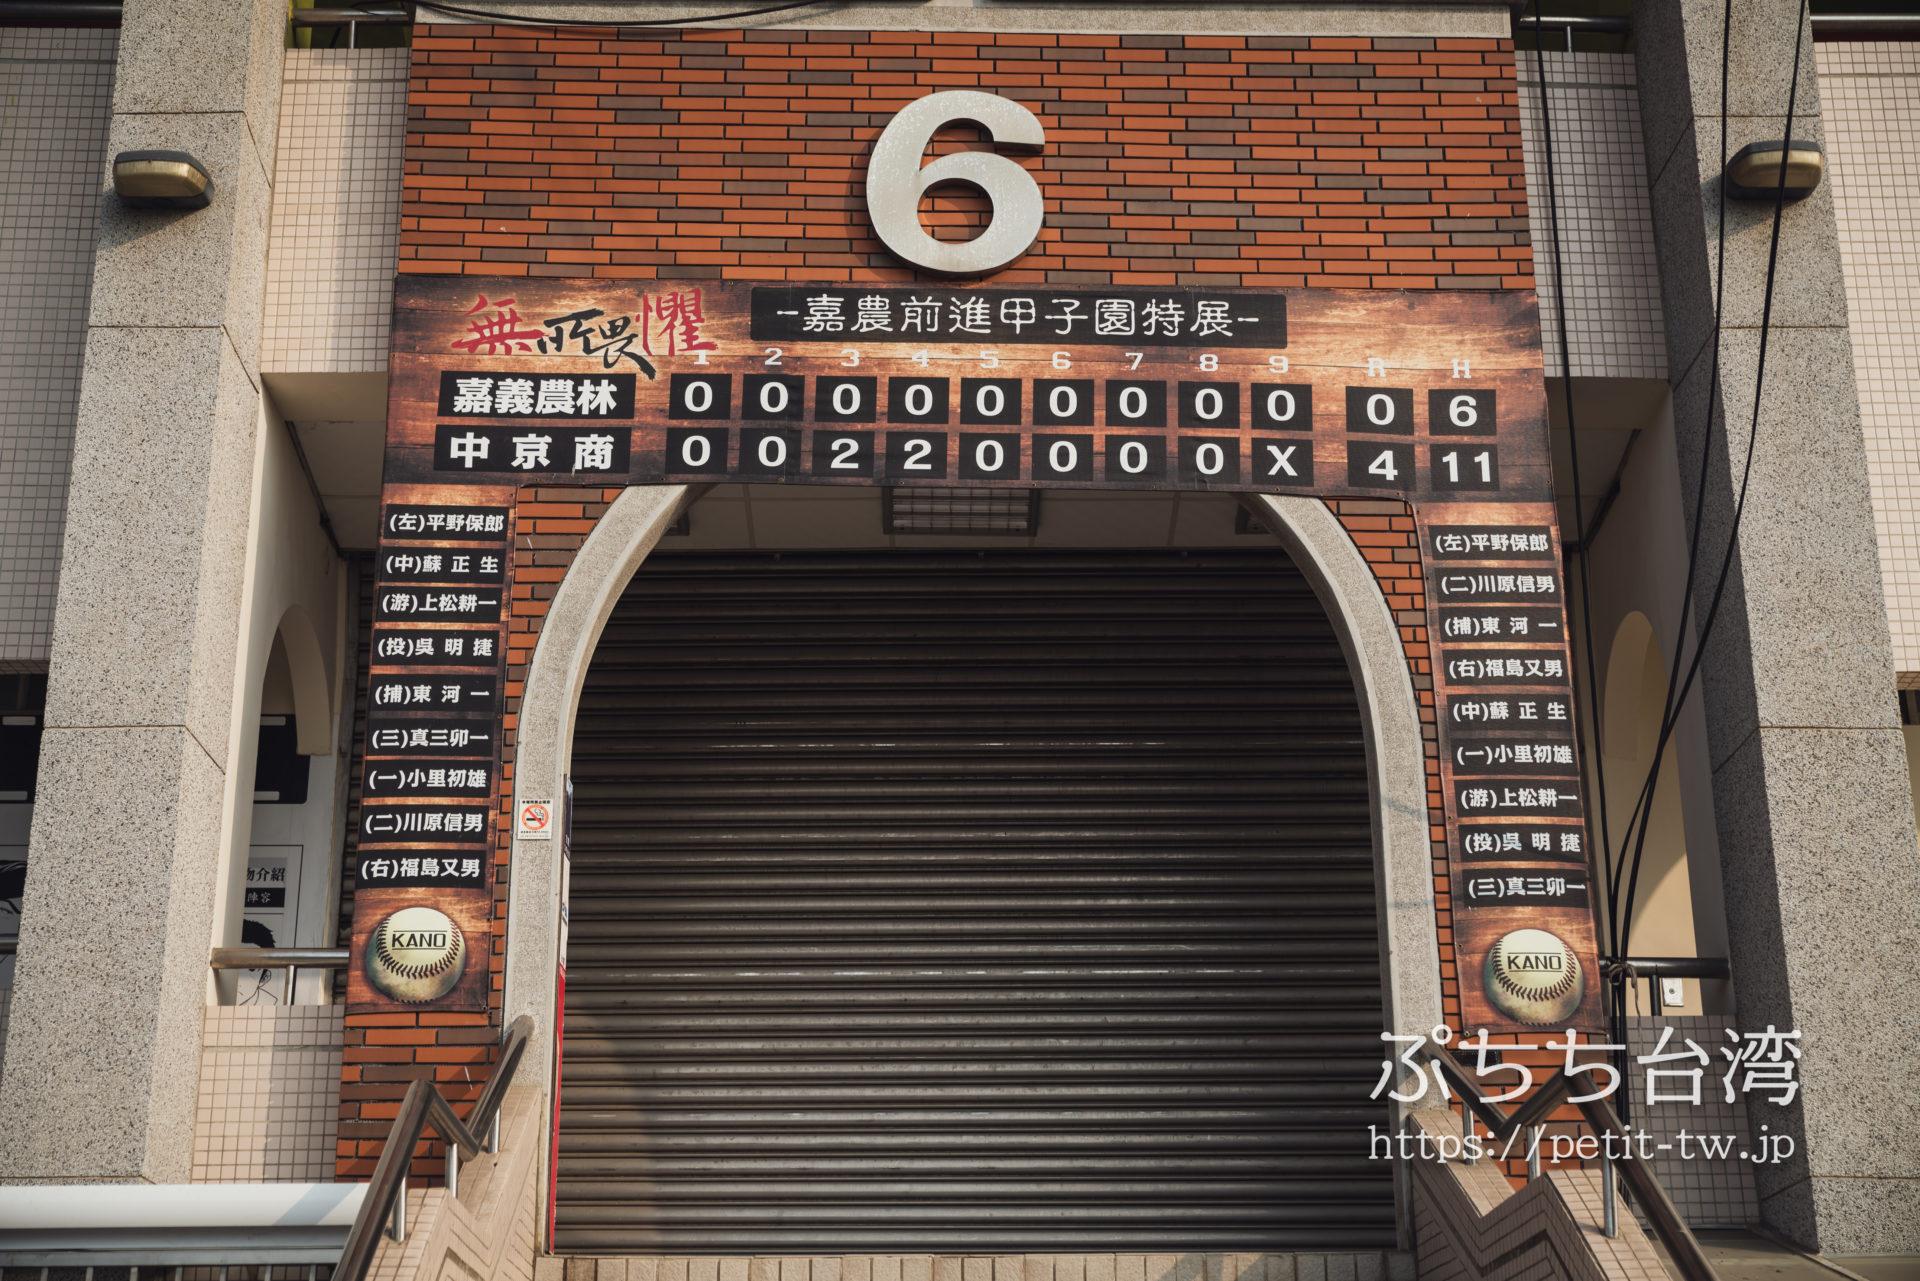 嘉義市立野球場 KANOの展示